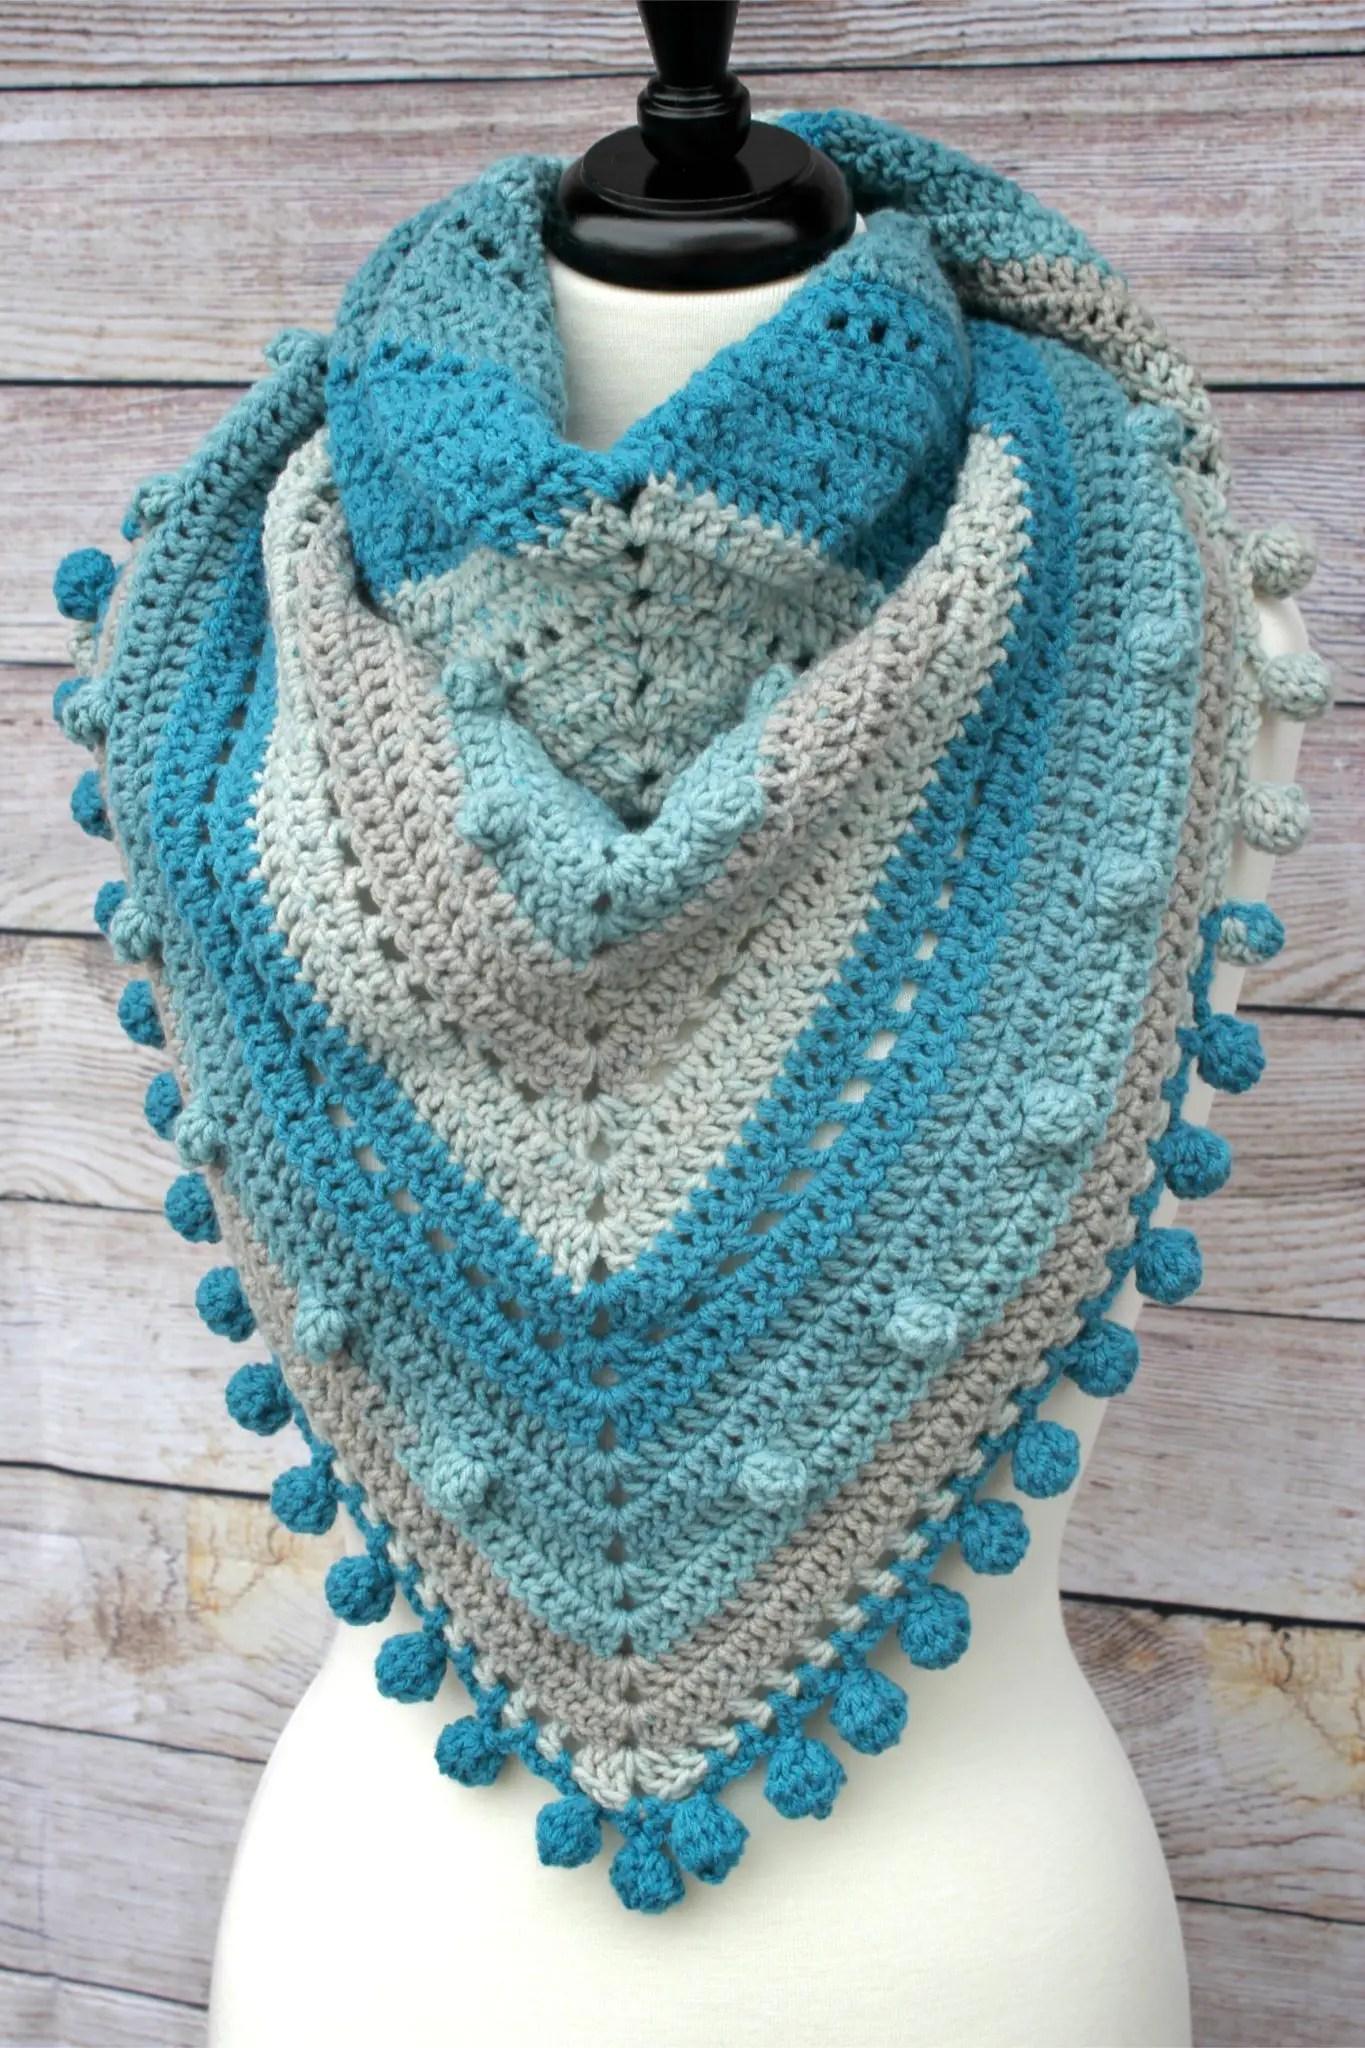 Big fan crochet stitch